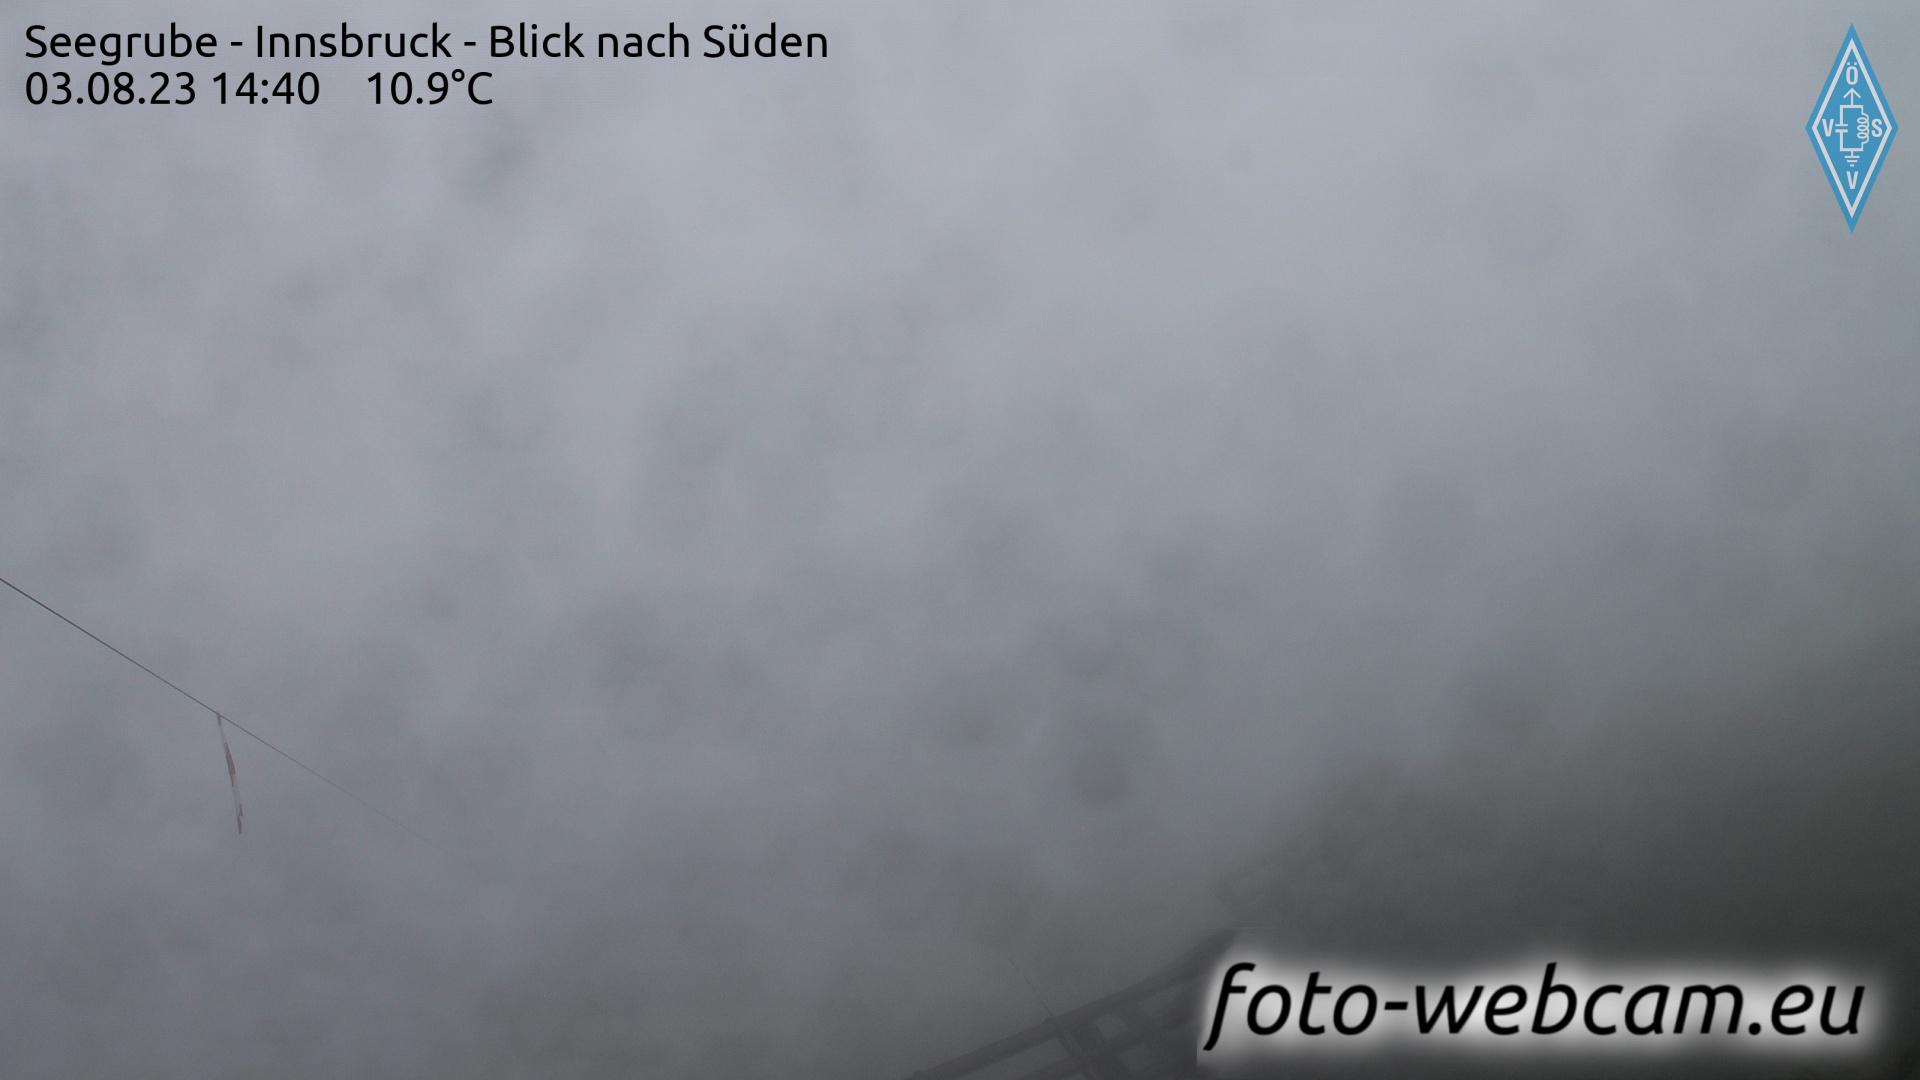 Innsbruck Wed. 14:18